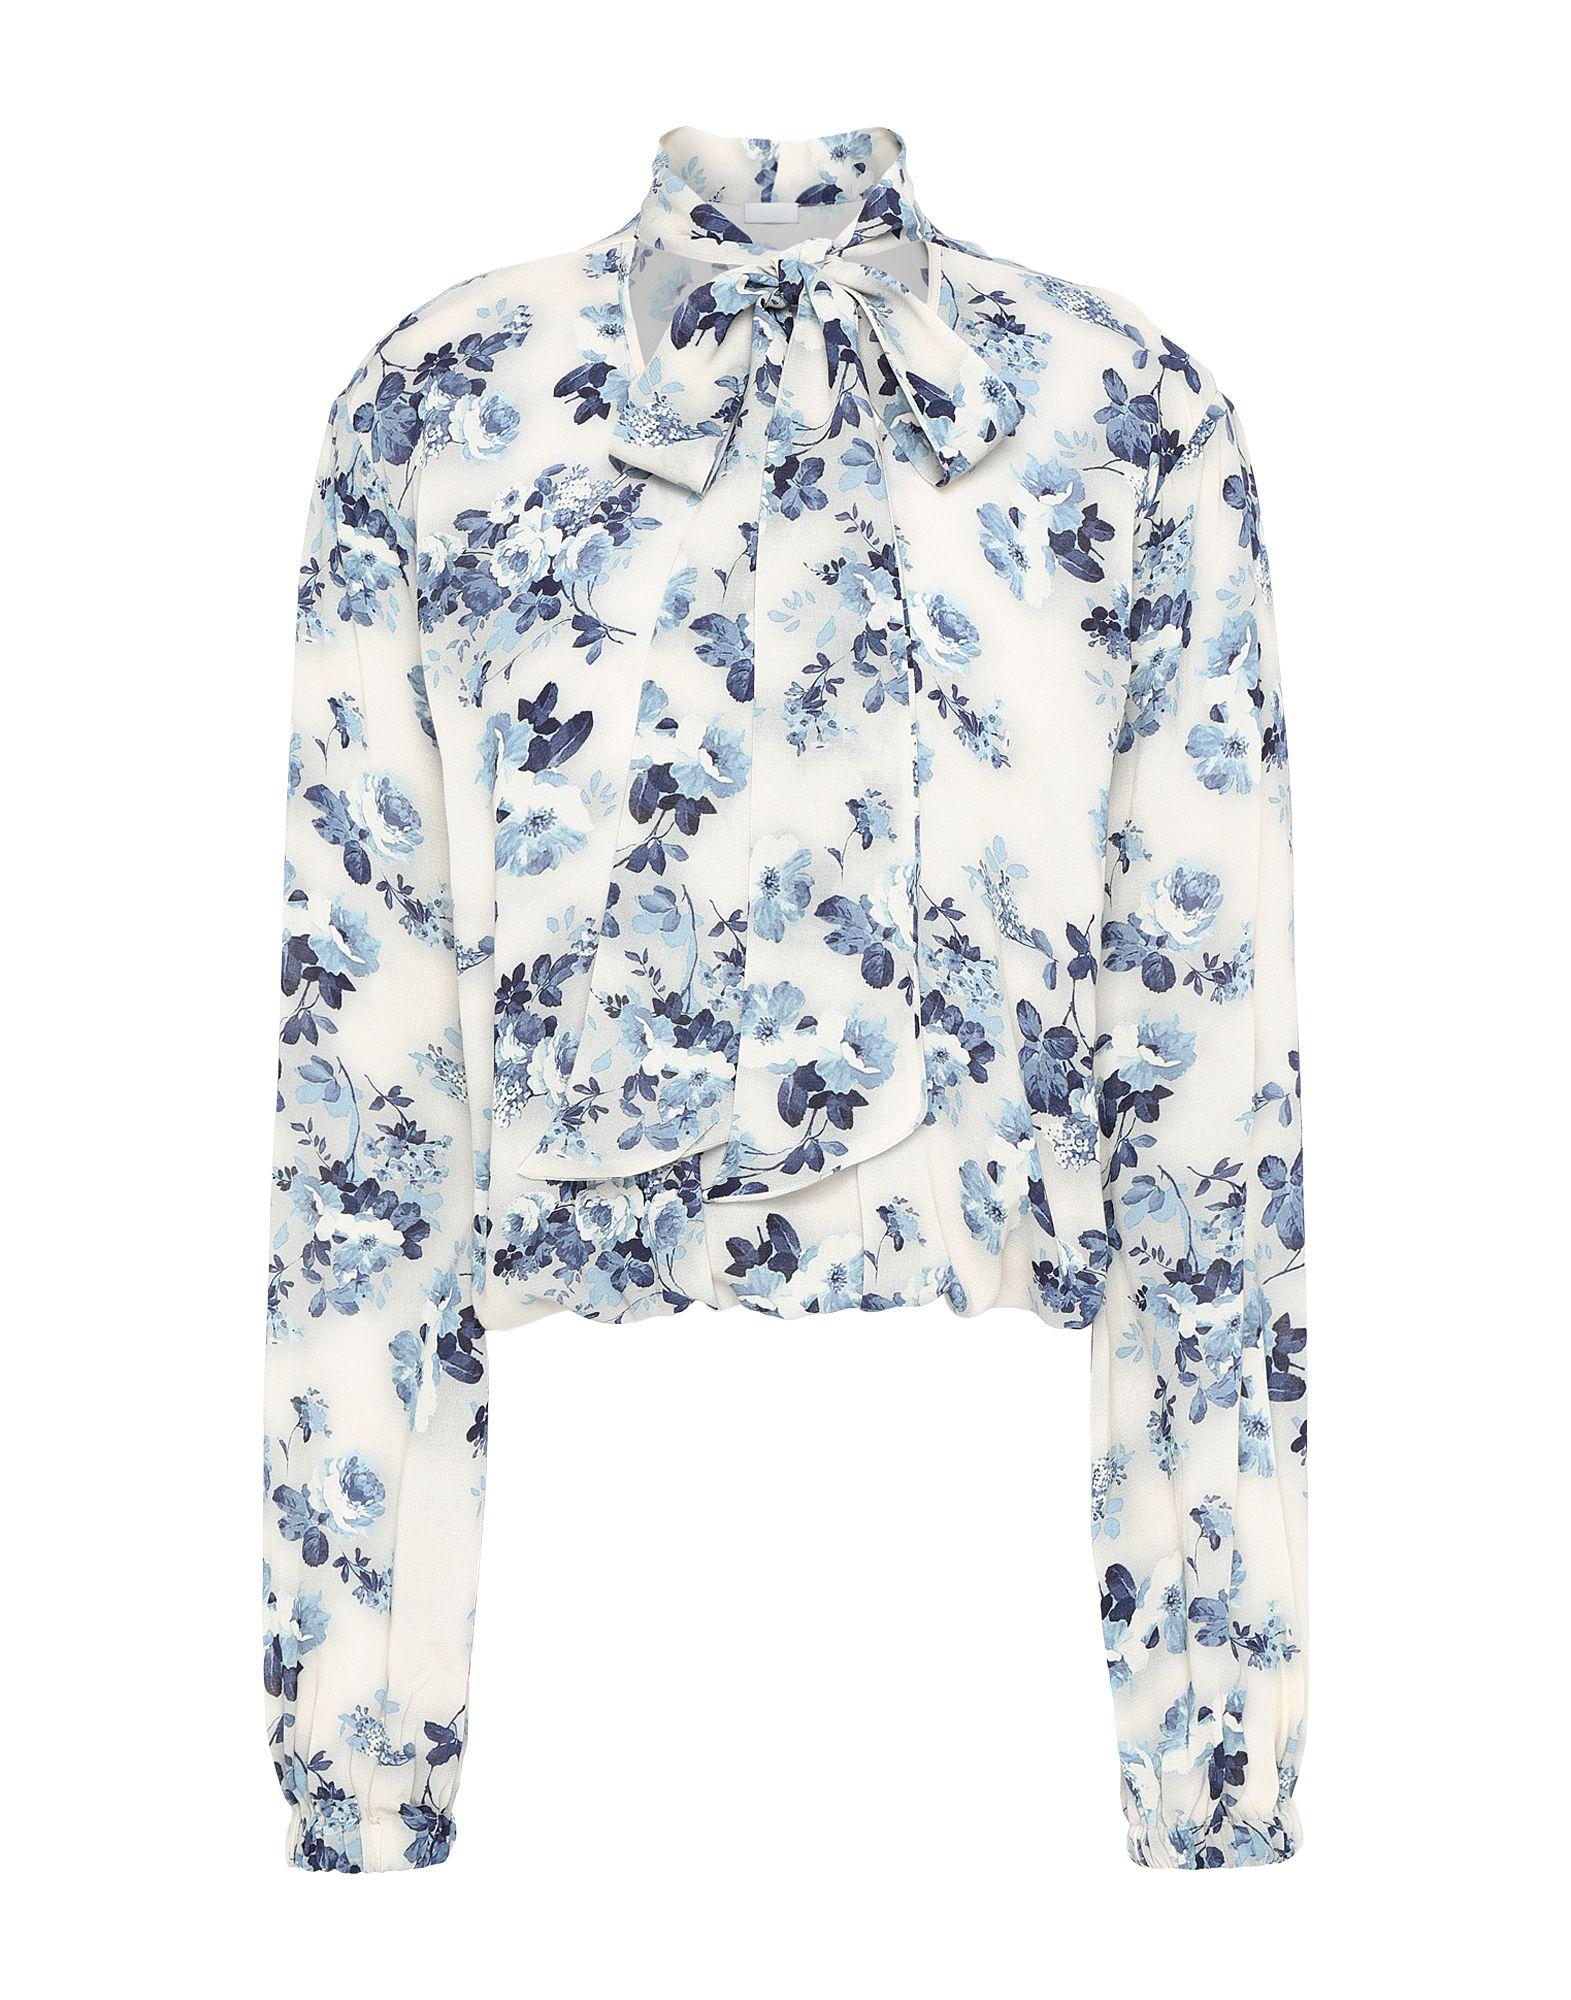 8 by YOOX Блузка 8 by yoox блузка